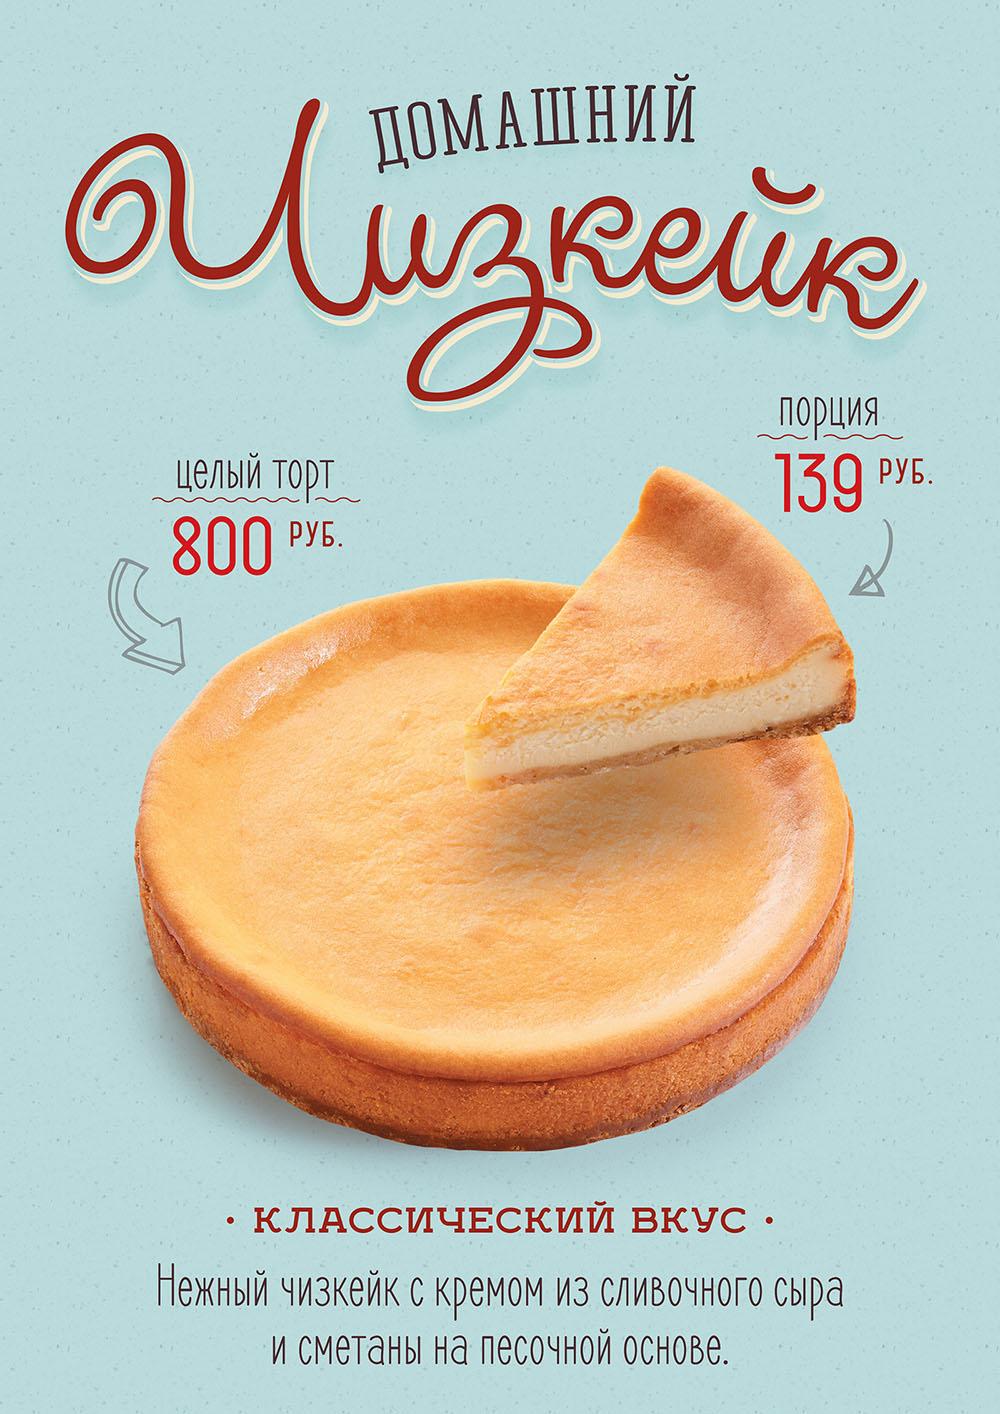 cheesecake A4 final.jpg